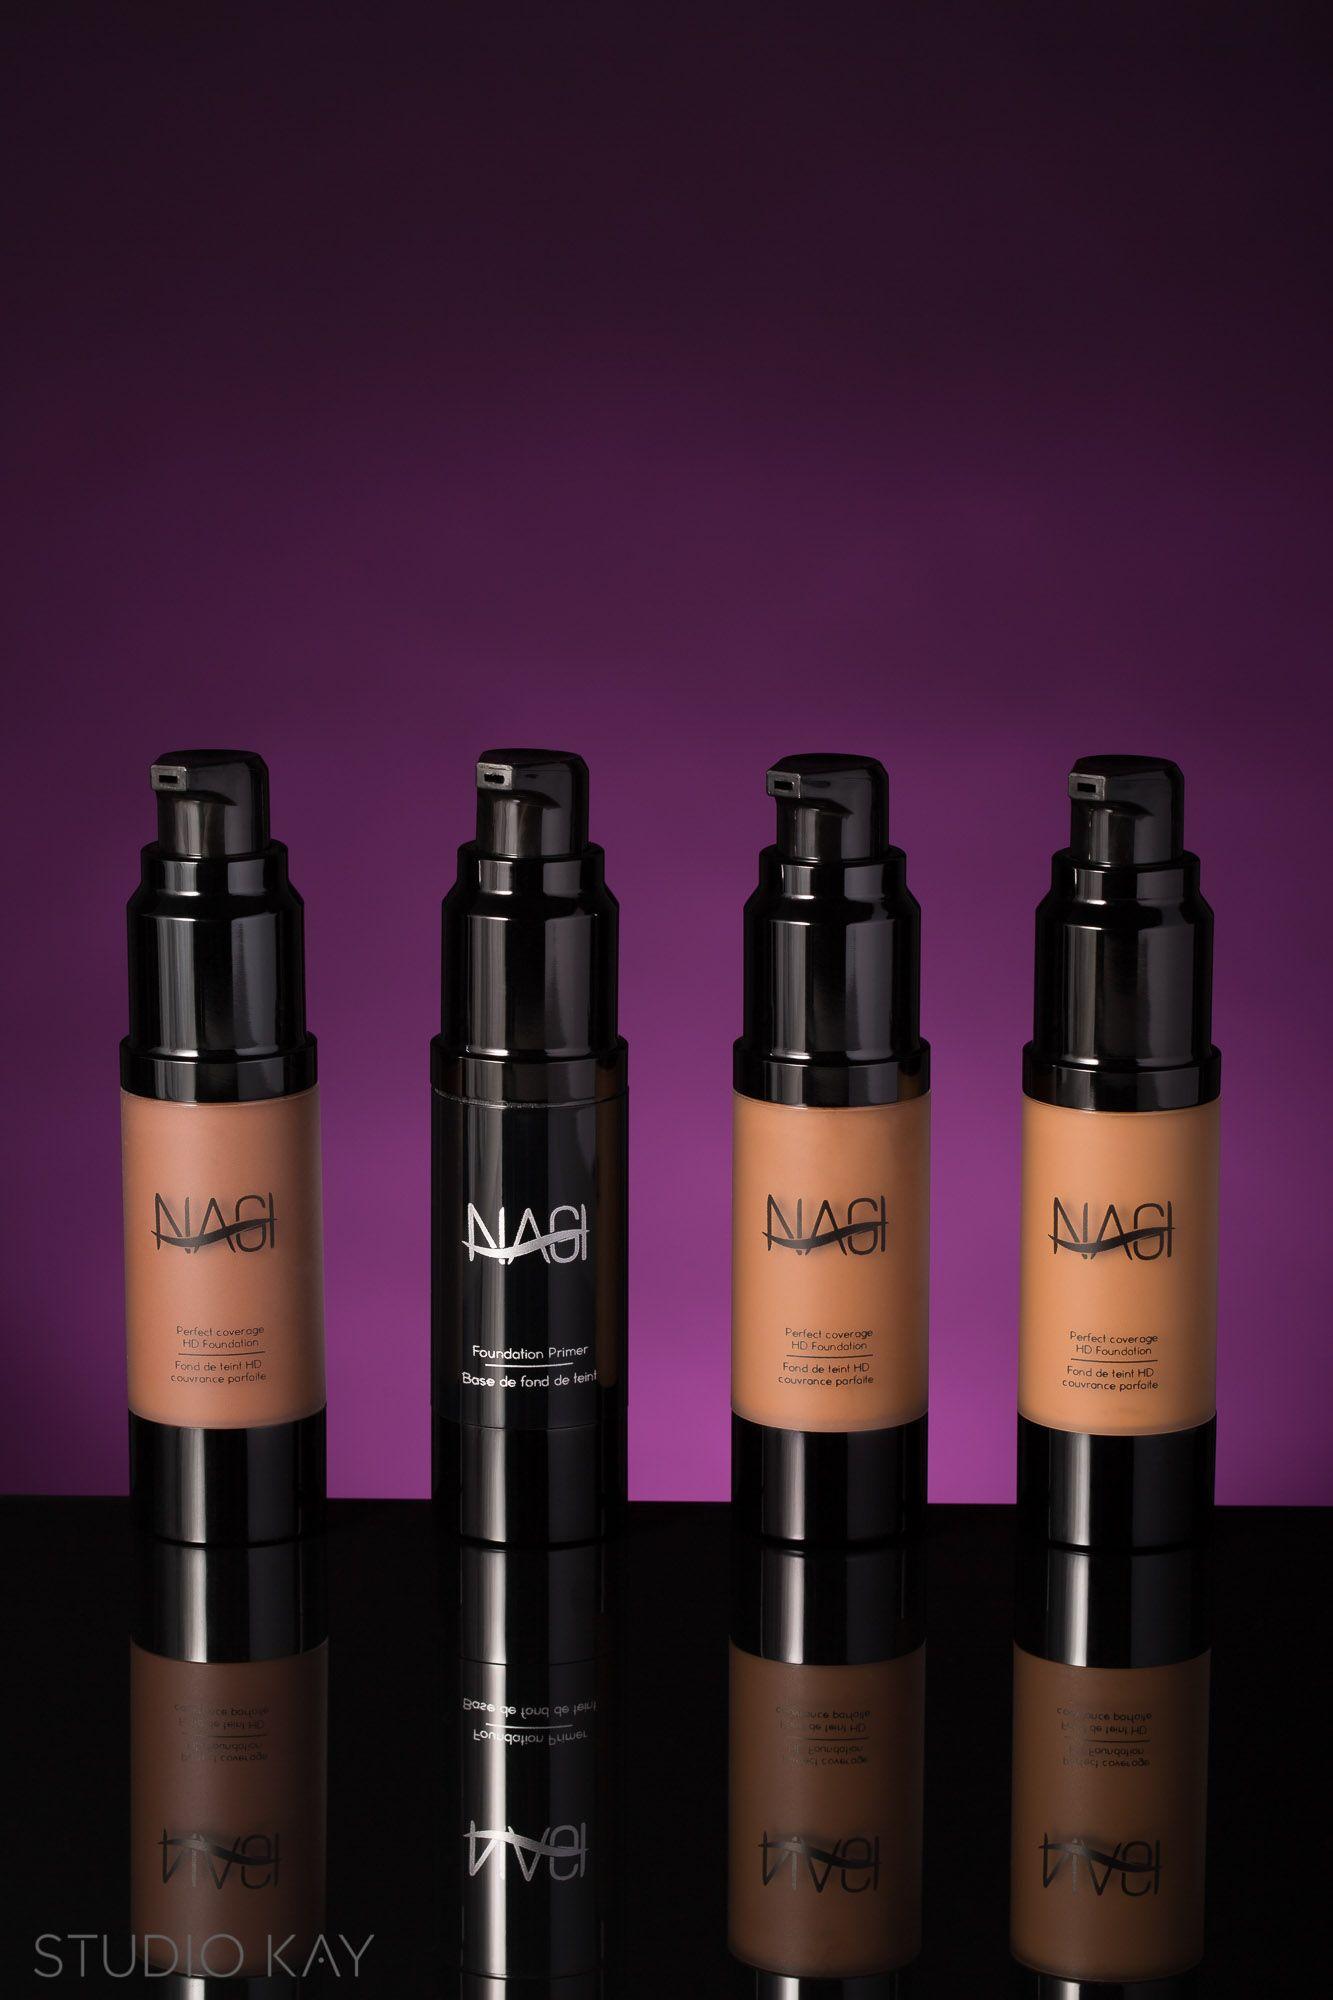 Lifestyle product photography, Nagi cosmetics | Studio Kay, Montreal commercial photography